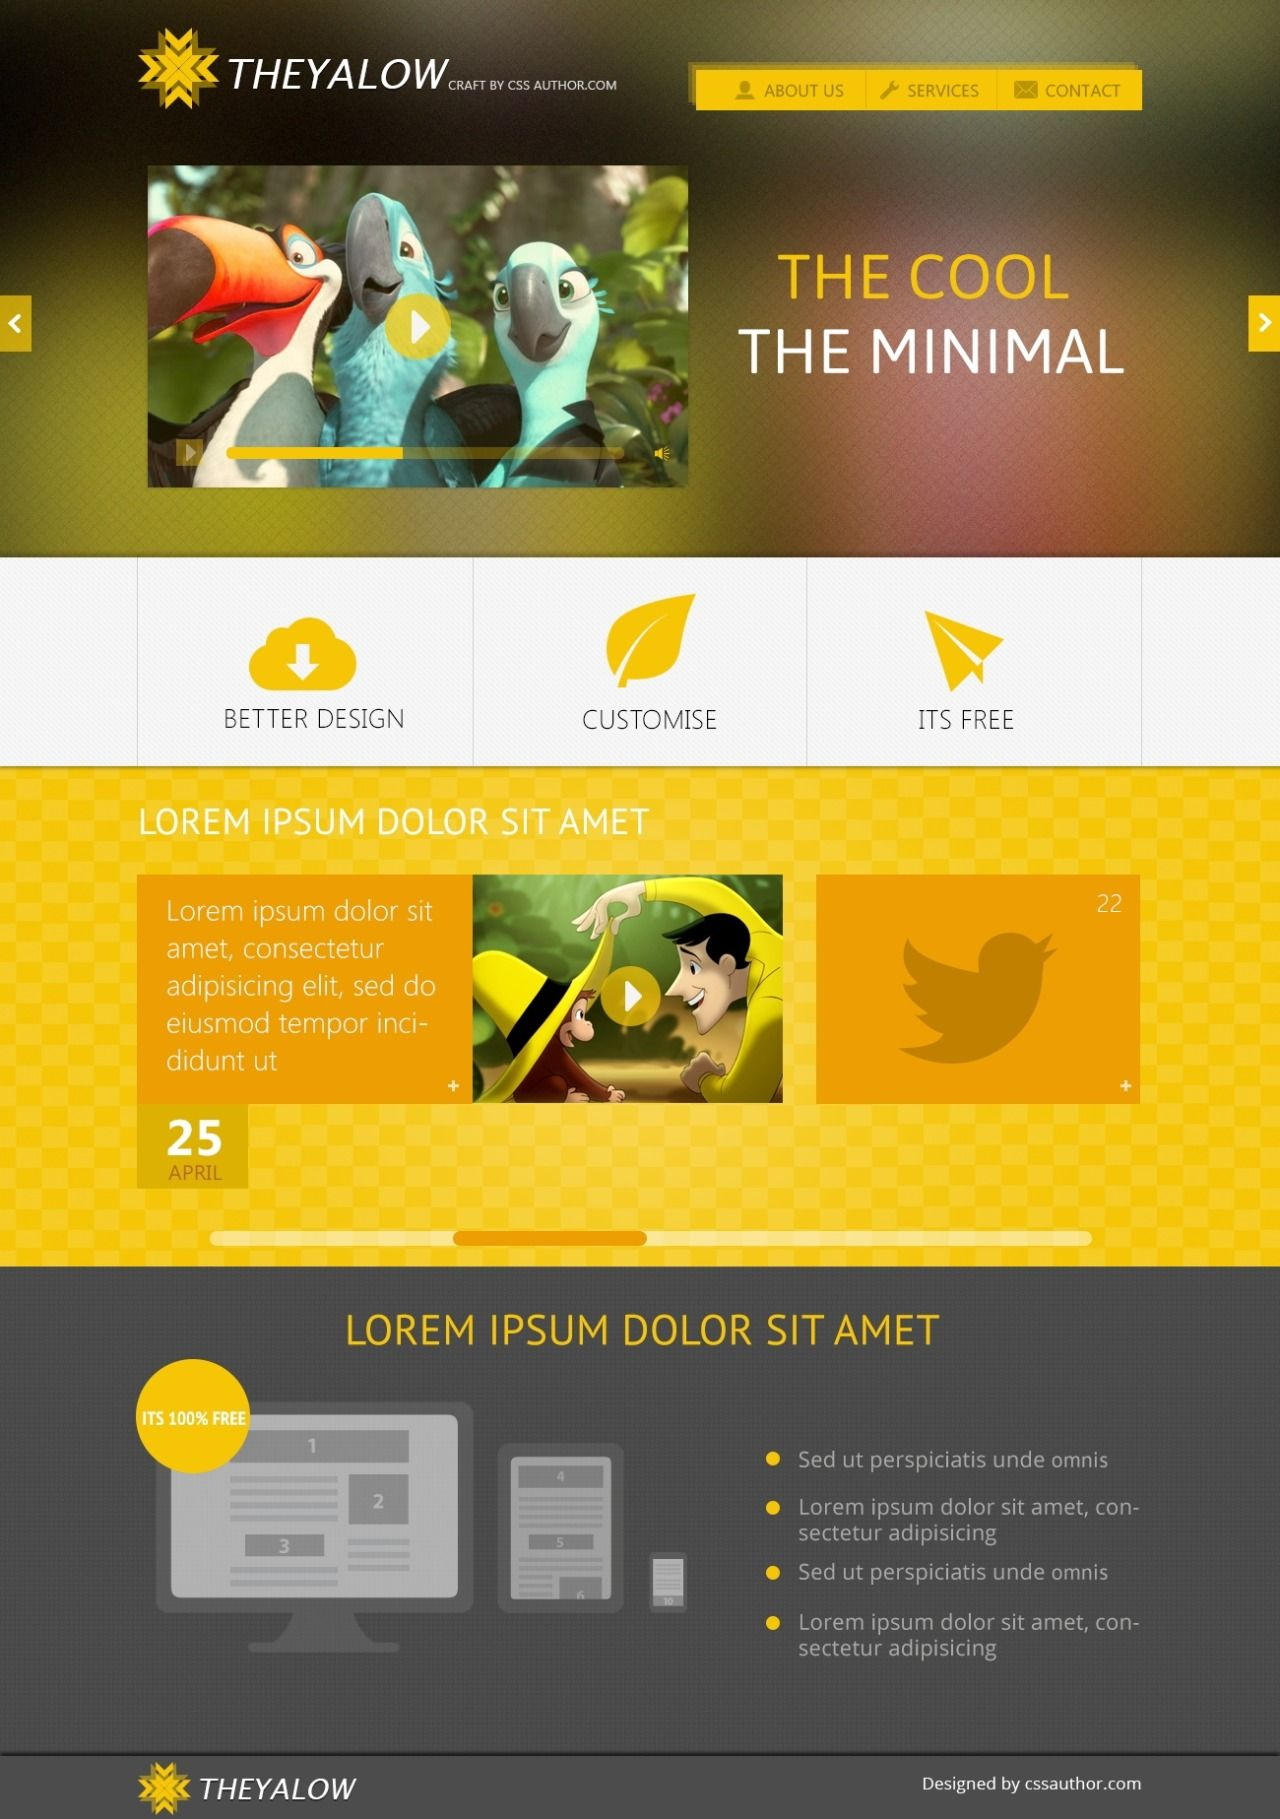 THEYALOW – A Responsive Web Design PSD Template | Web Design ...